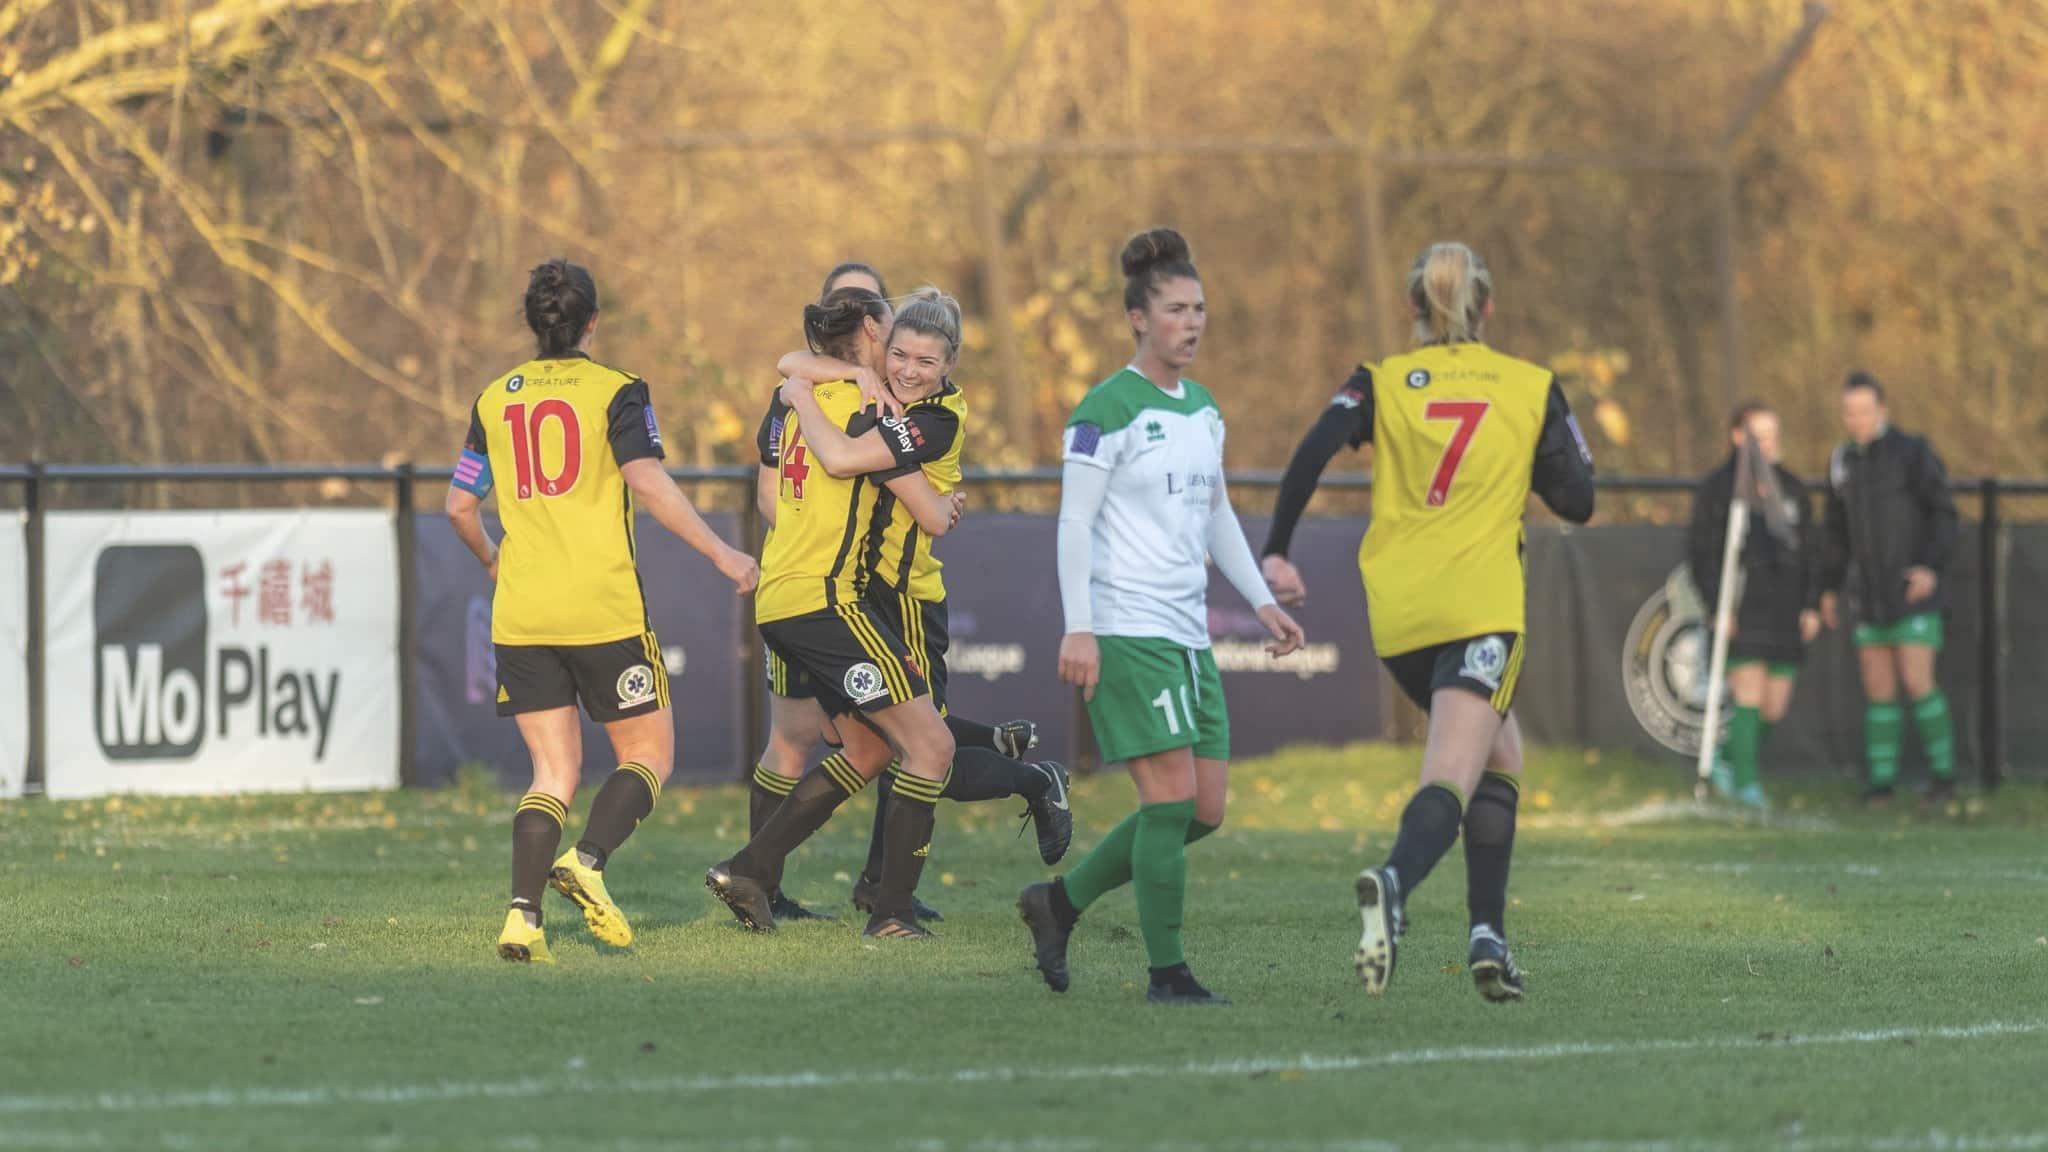 Danielle Scanlon celebrates scoring the only goal of the game.